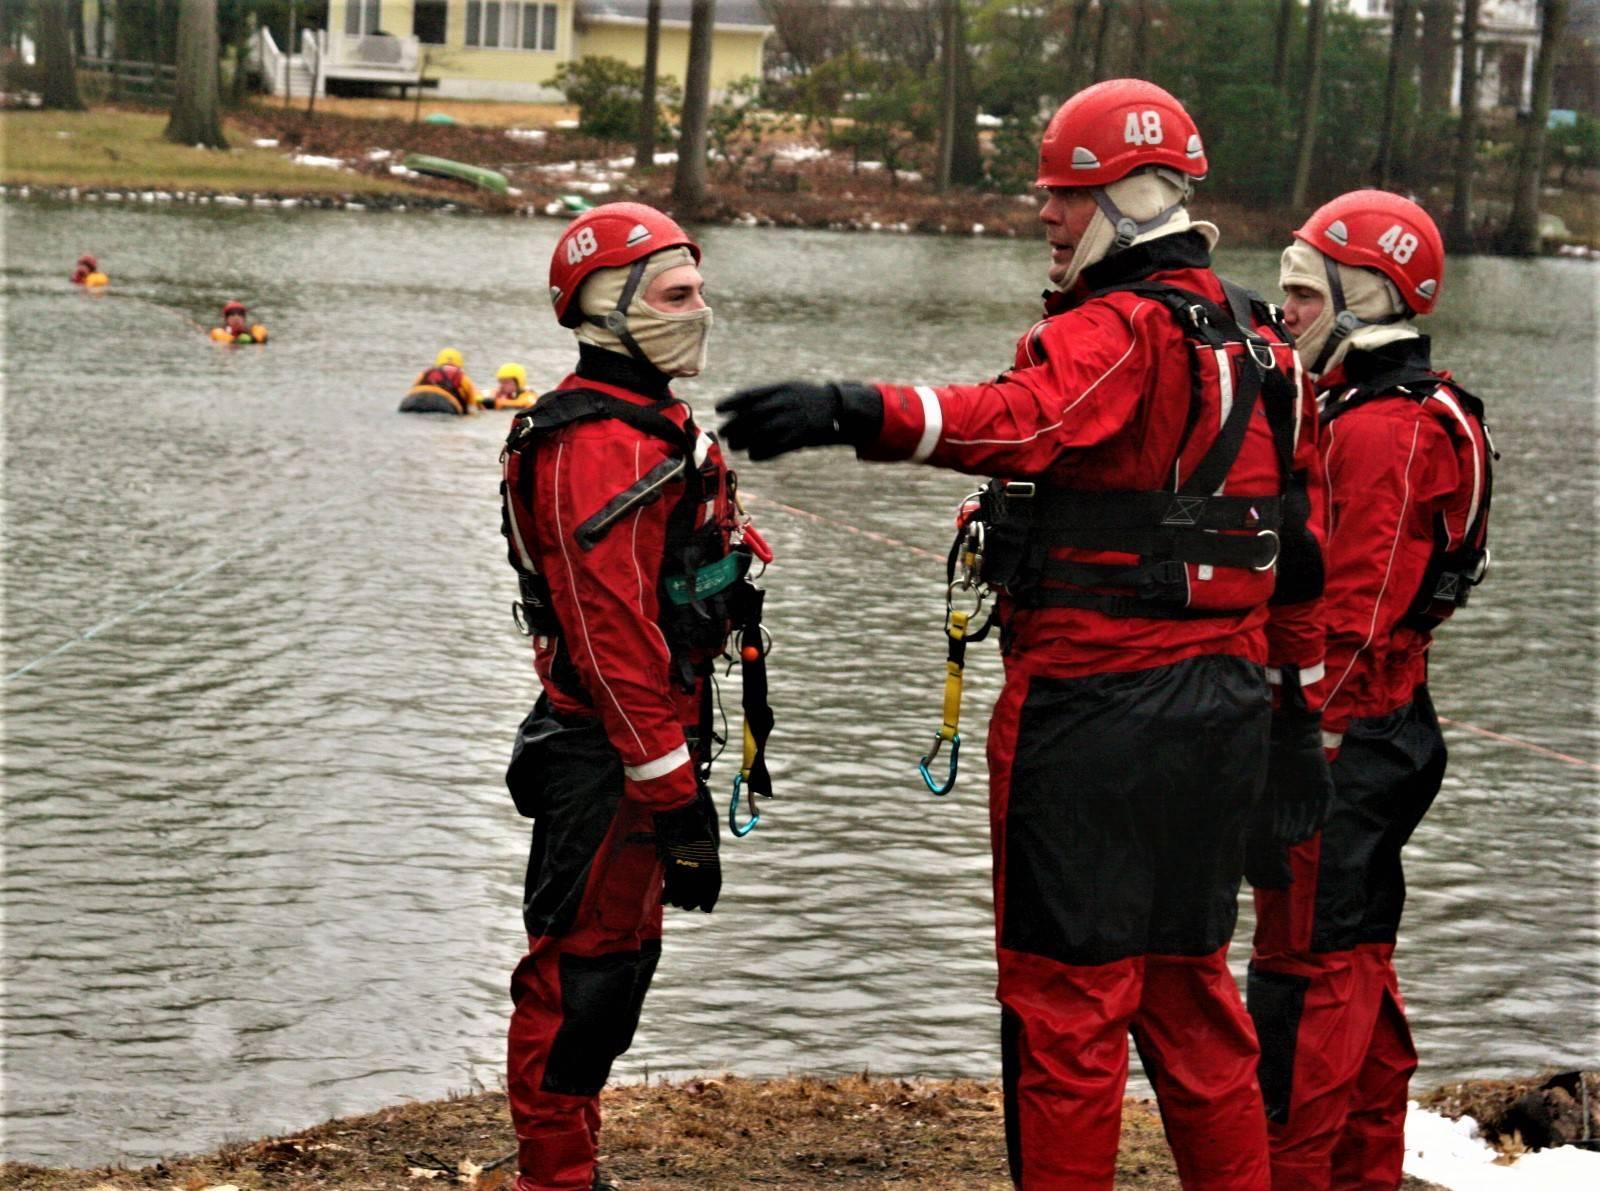 Cranbury Fire Company Conducts Ice Rescue Training South Brunswick Cranbury Nj News Tapinto